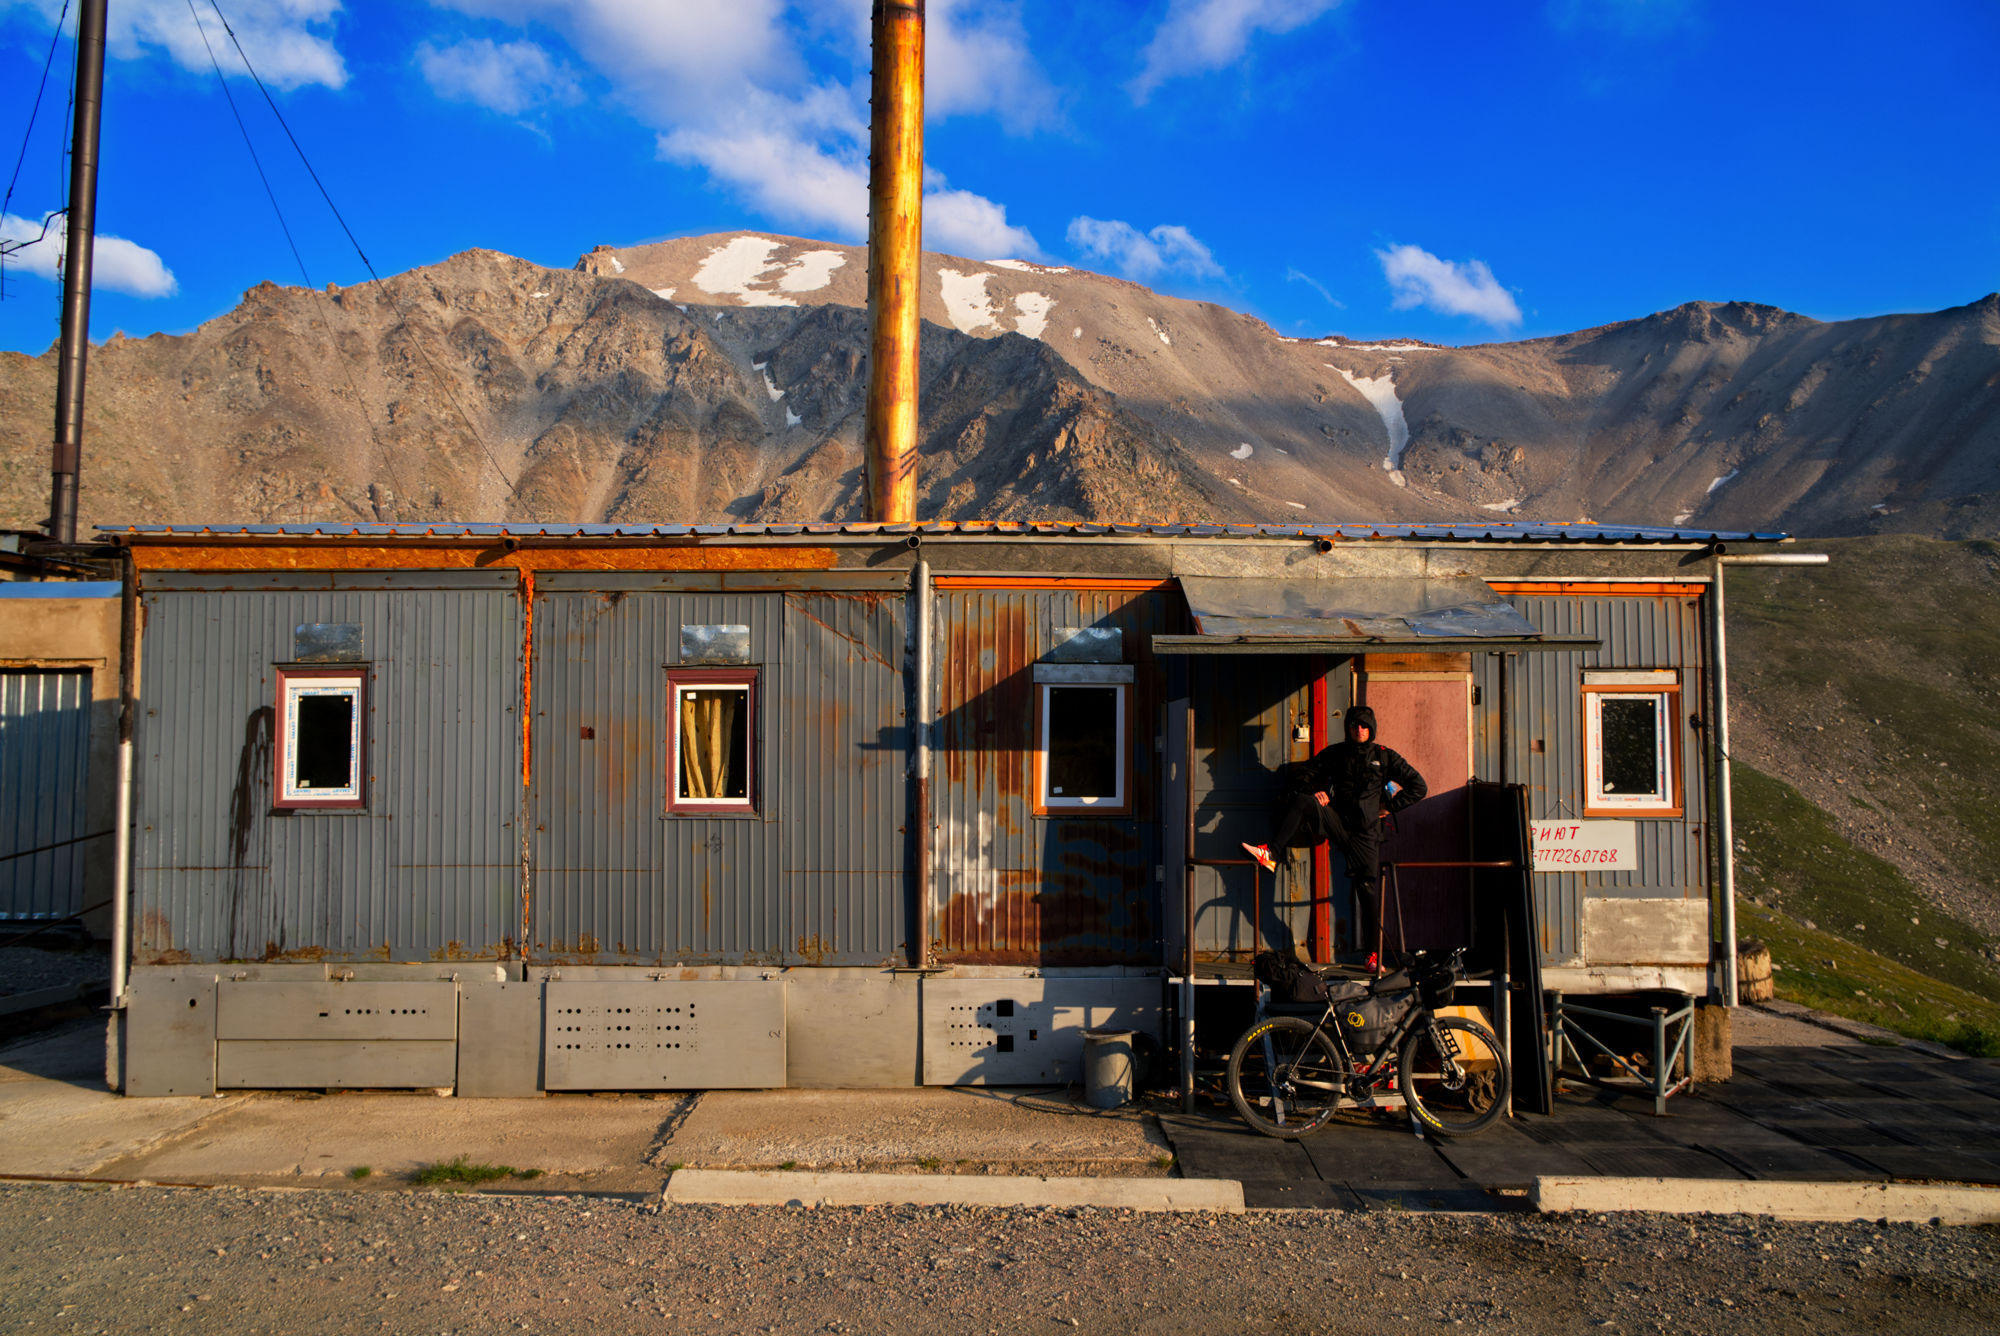 Kosmo-Station in Kazakhztan at Big Almaty Lake